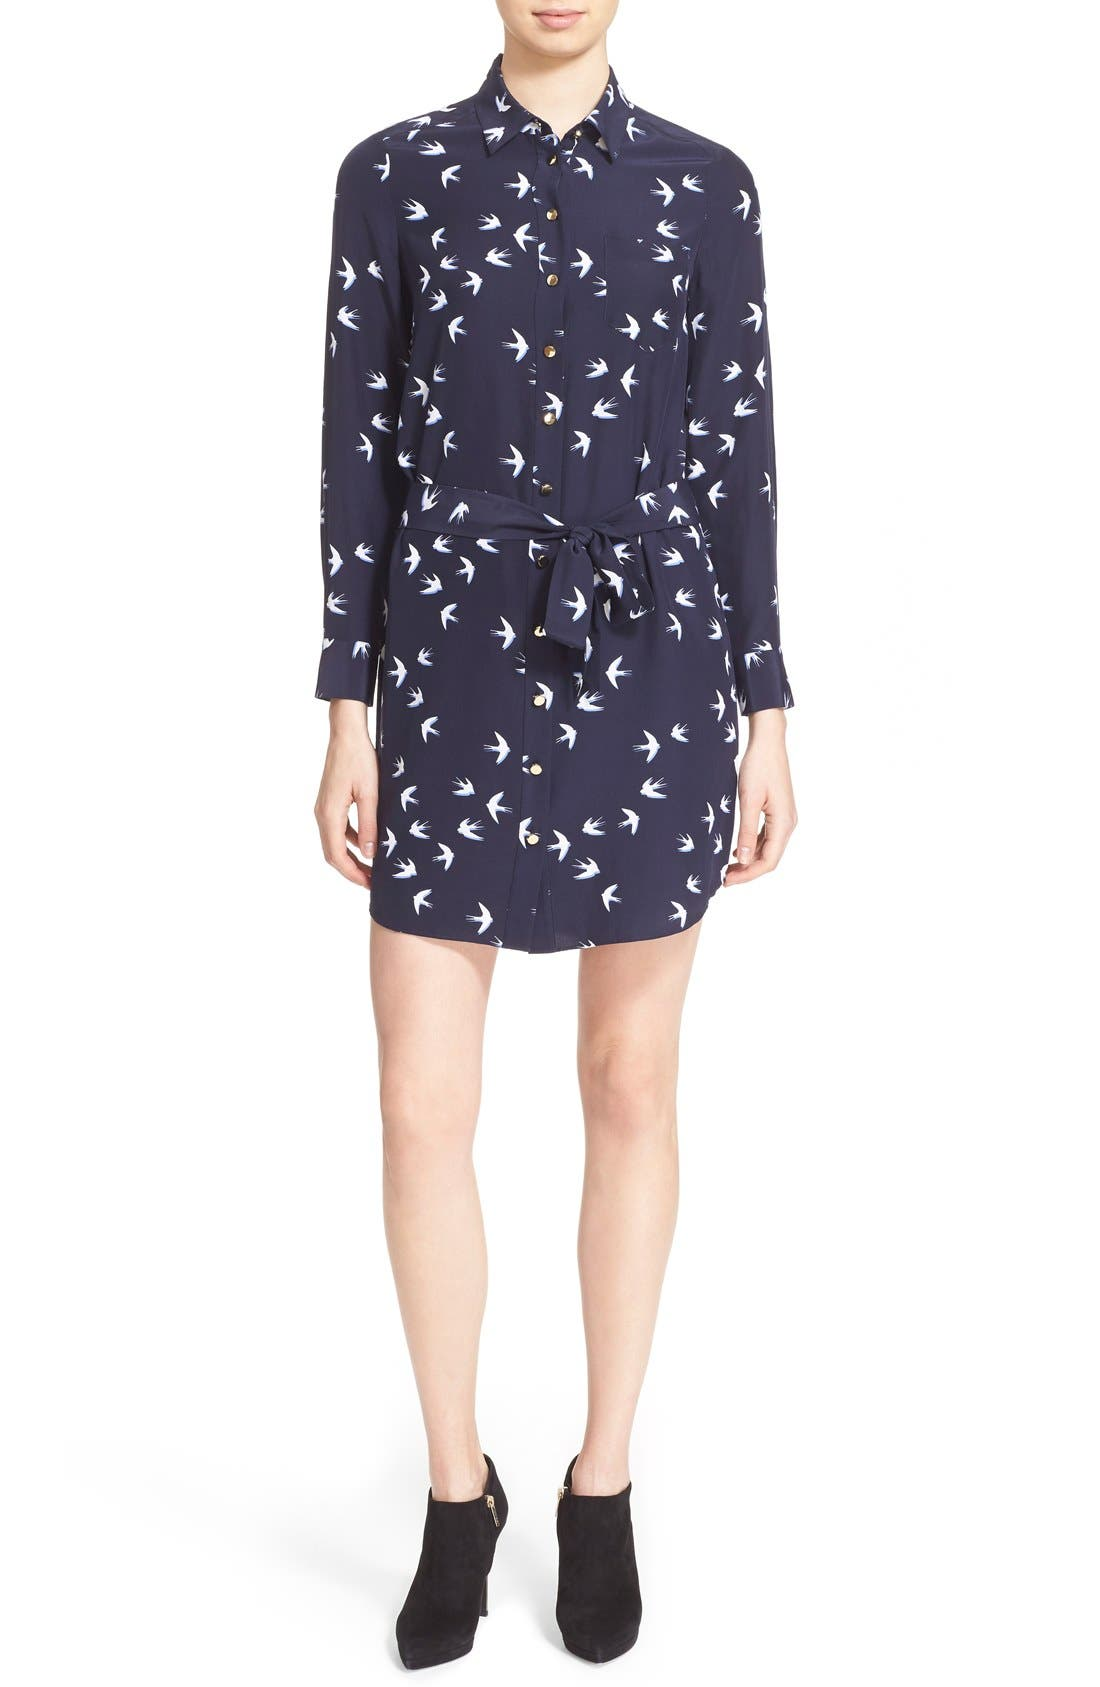 Alternate Image 1 Selected - kate spade new york 'winter' print shirtdress